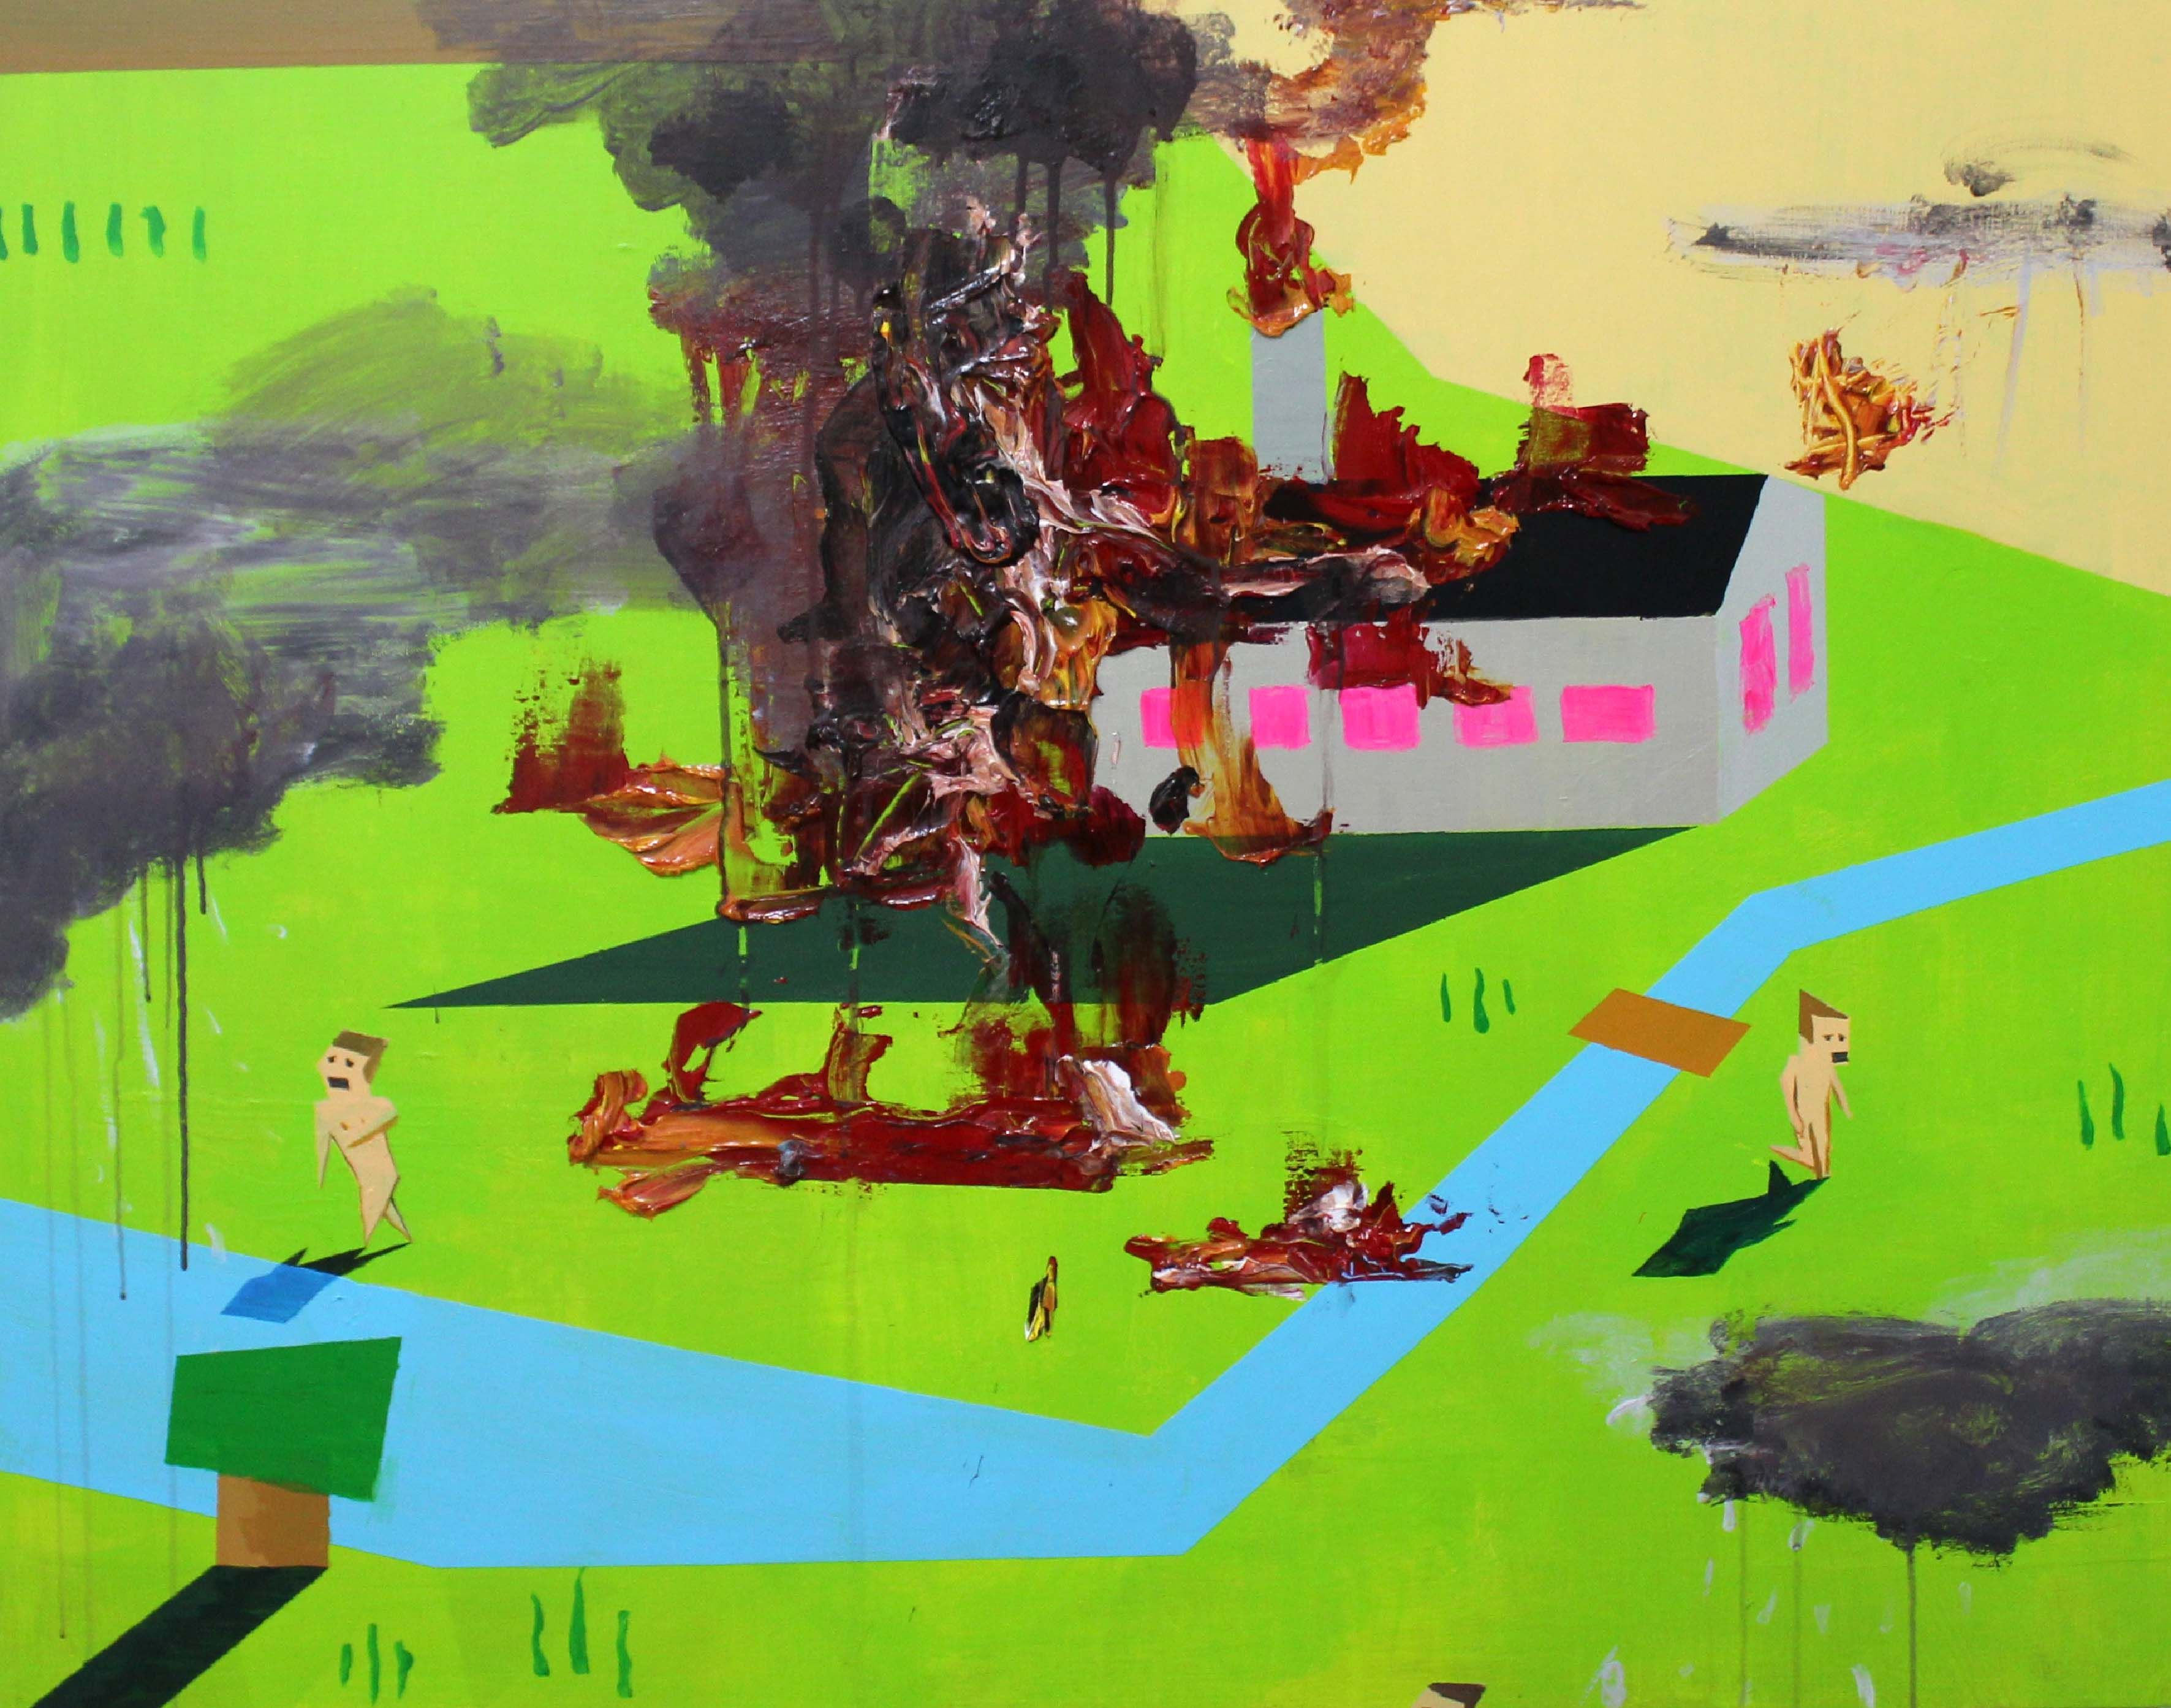 Zen Tainaka, Fire, acrylic on canvas, 91×116.7cm, 2015